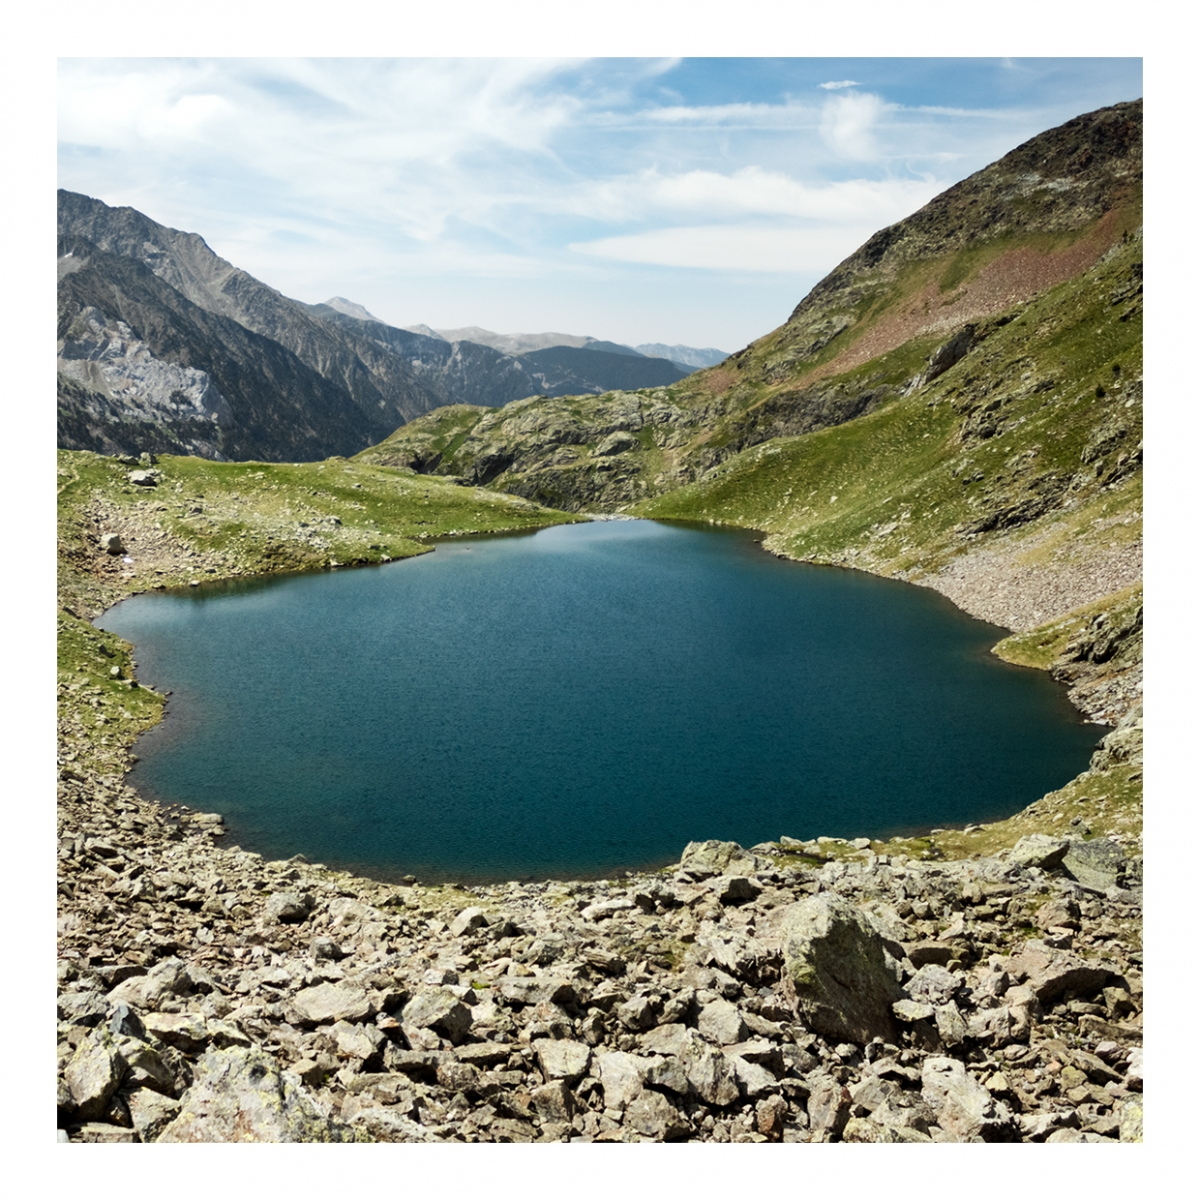 Imagen en la que se ve un lago